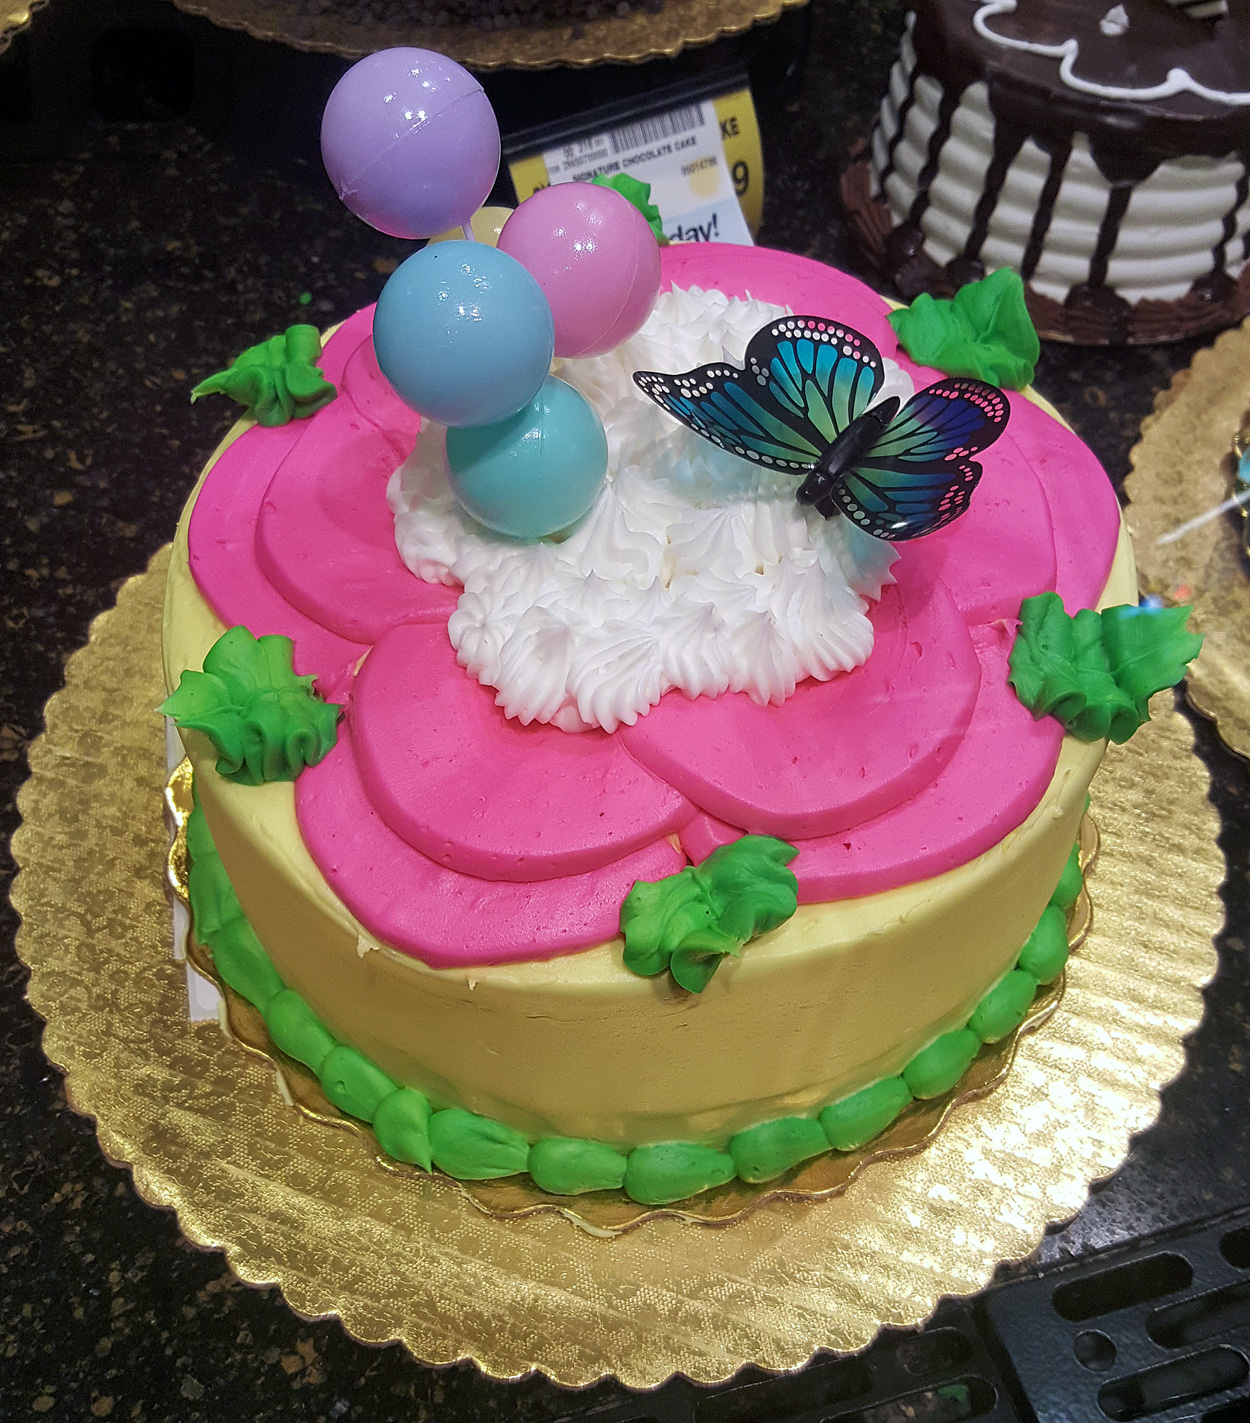 Safeway Cakes – Tasty Island